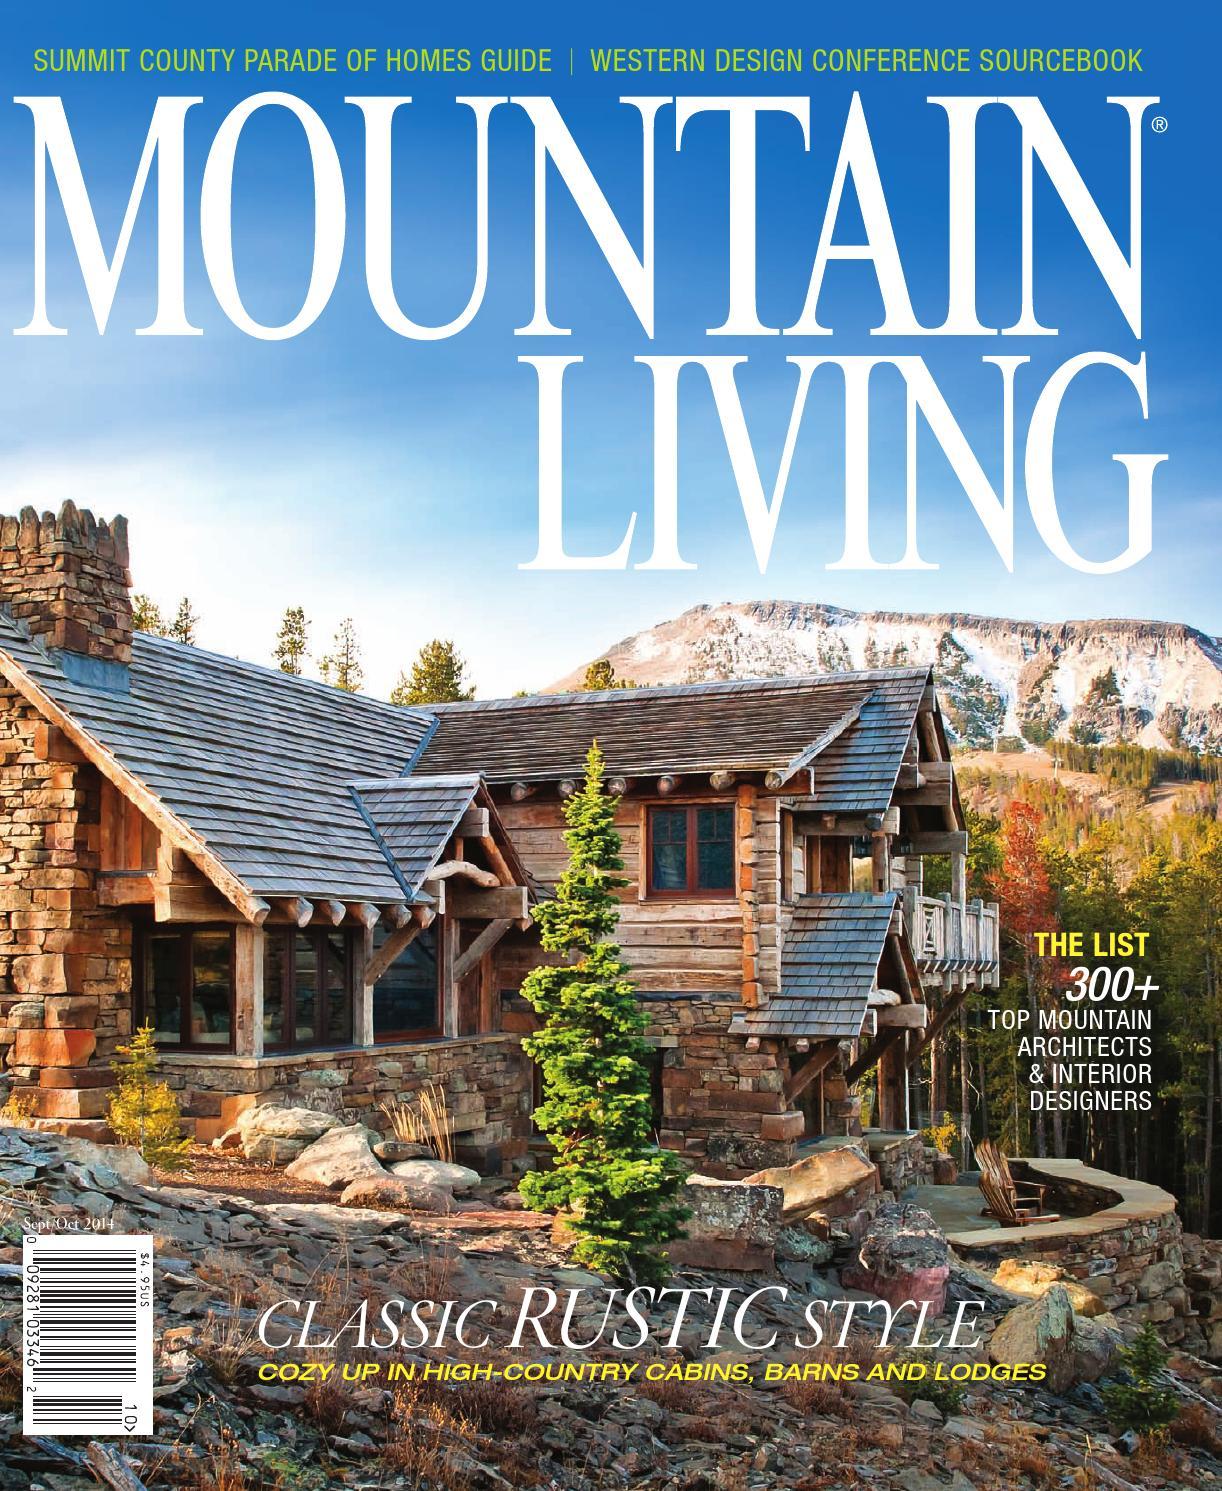 Mountain living september october 2014 by network for Mountain living